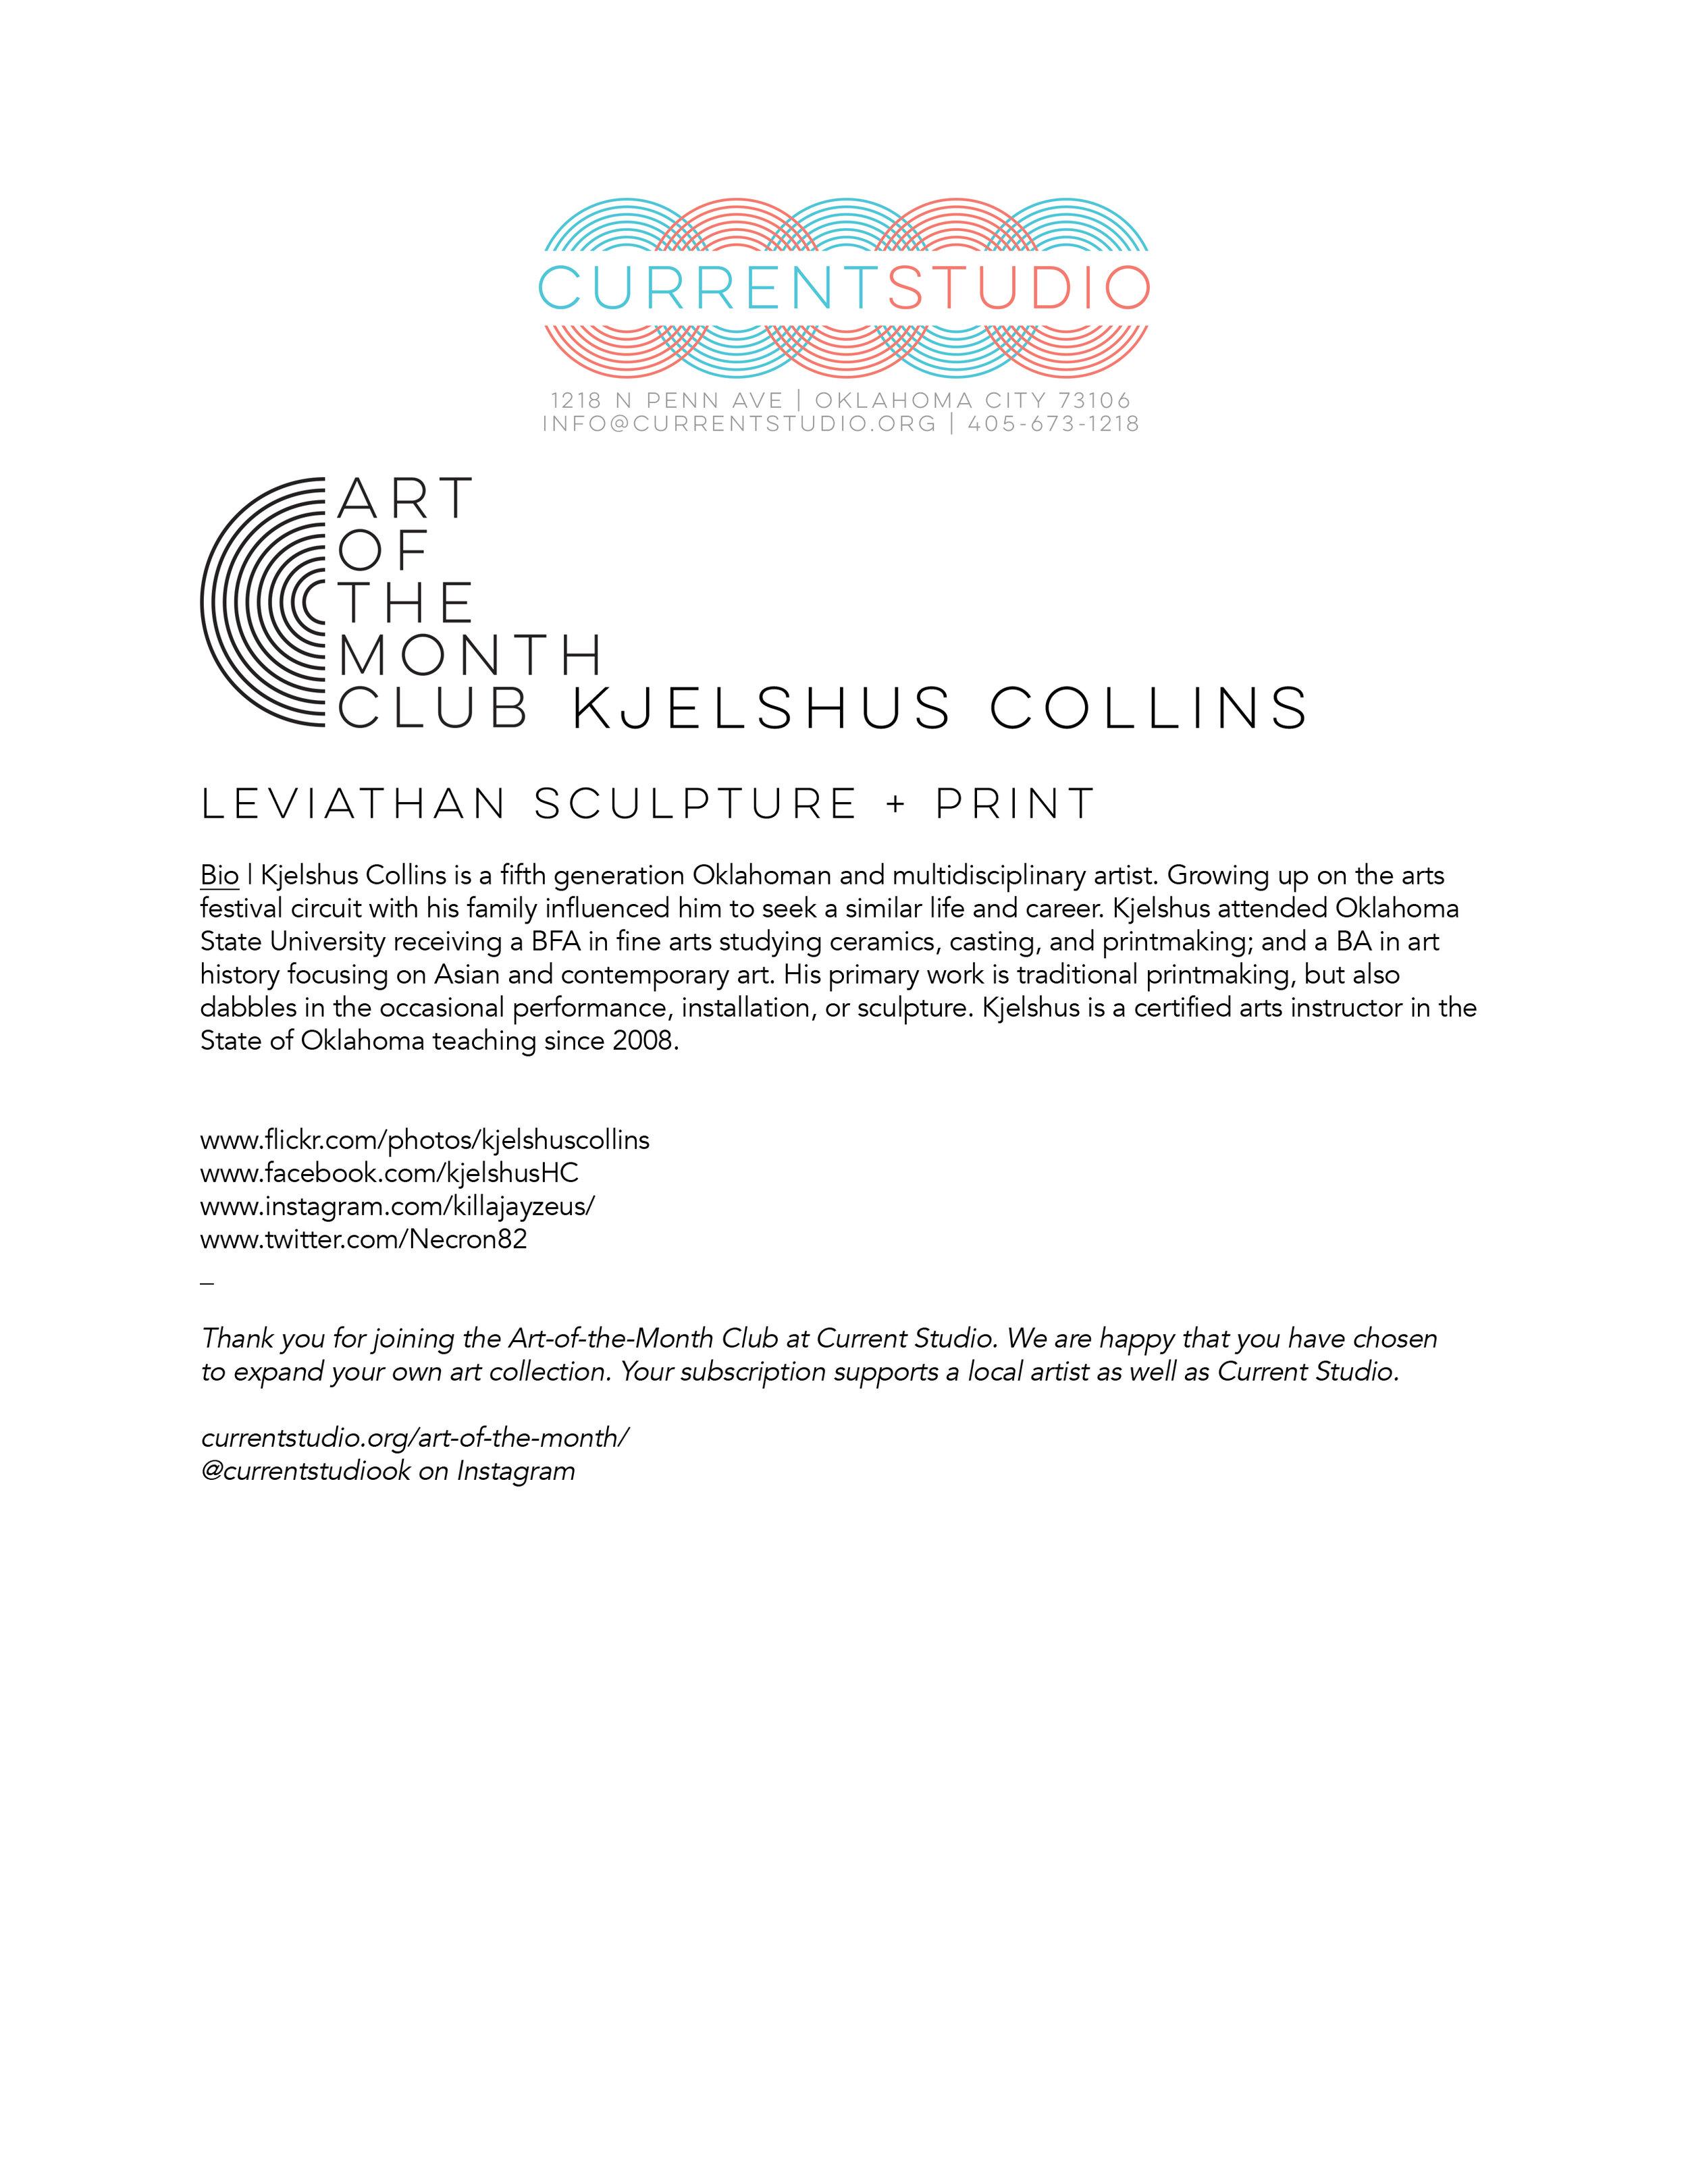 art of the month artist sheet - kj collins.jpg